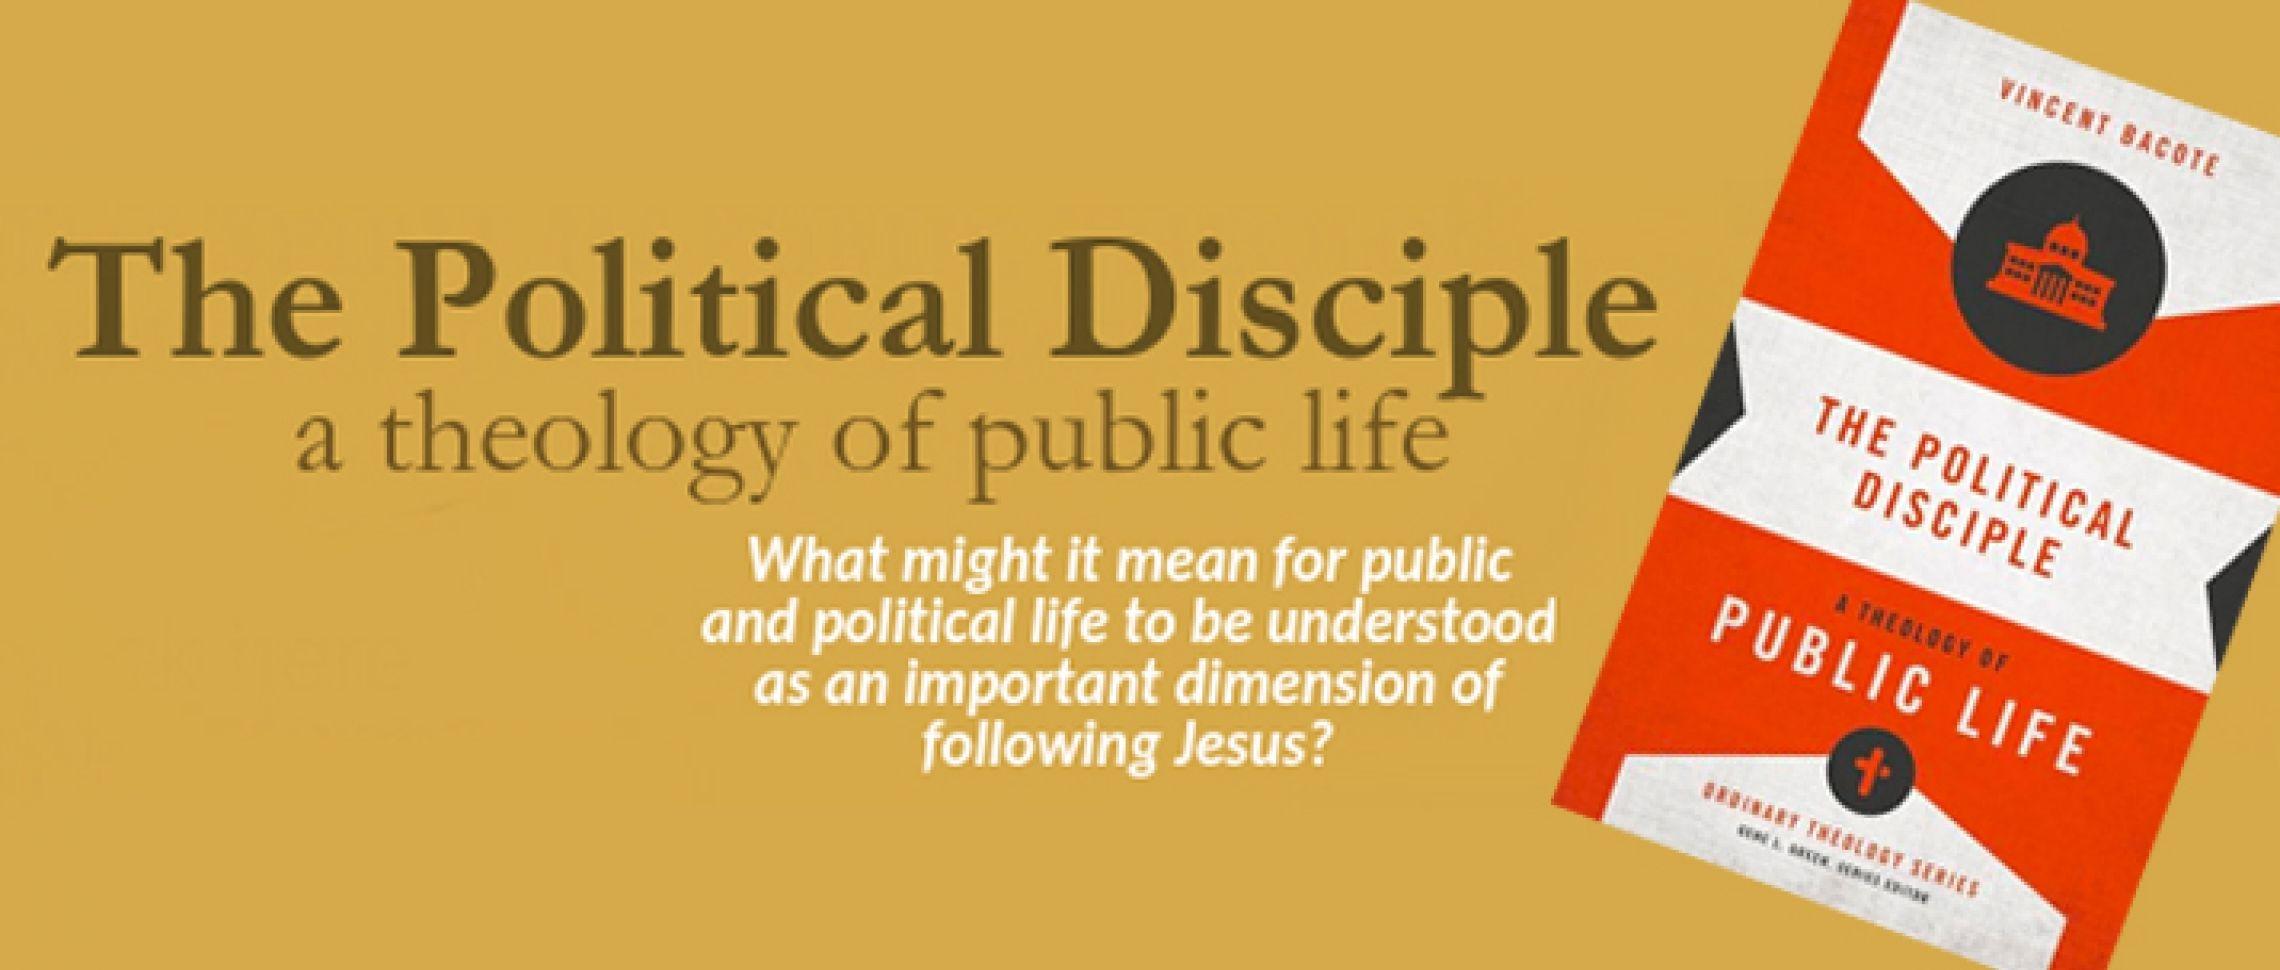 txb life - Ethical Living Blog